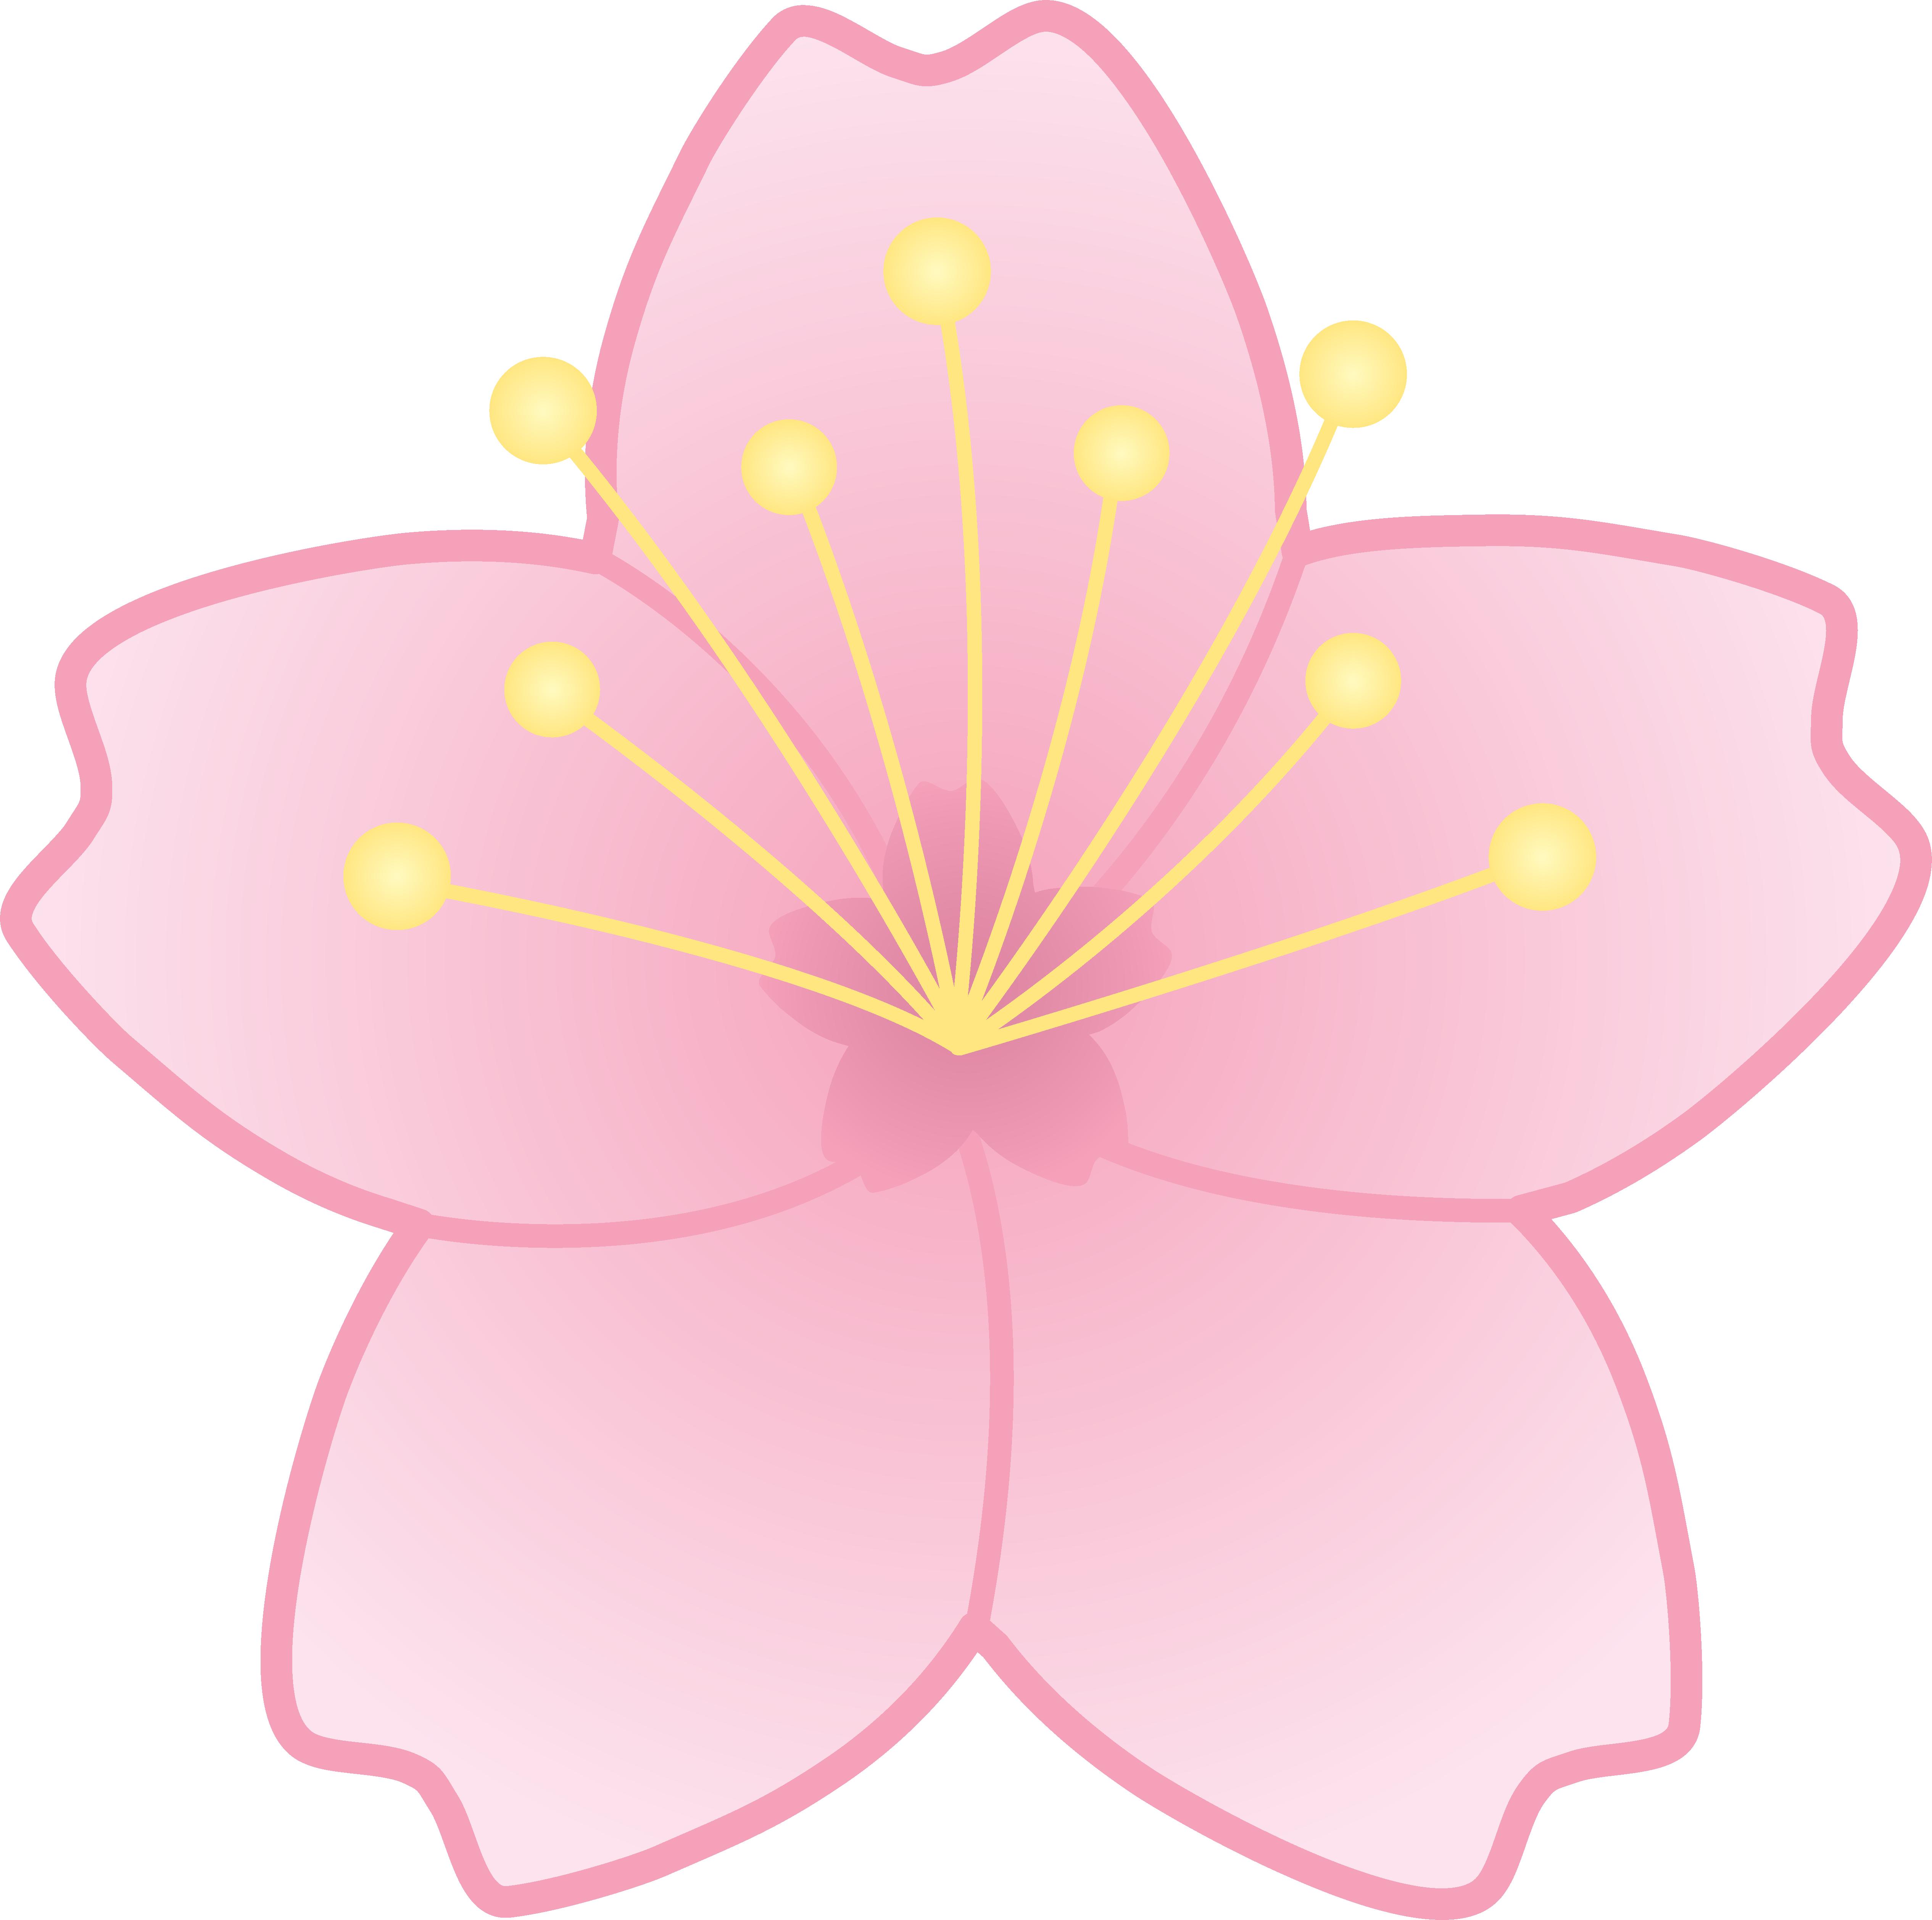 Sakura flower clipart picture royalty free Pink Cherry Blossom Flower - Free Clip Art picture royalty free